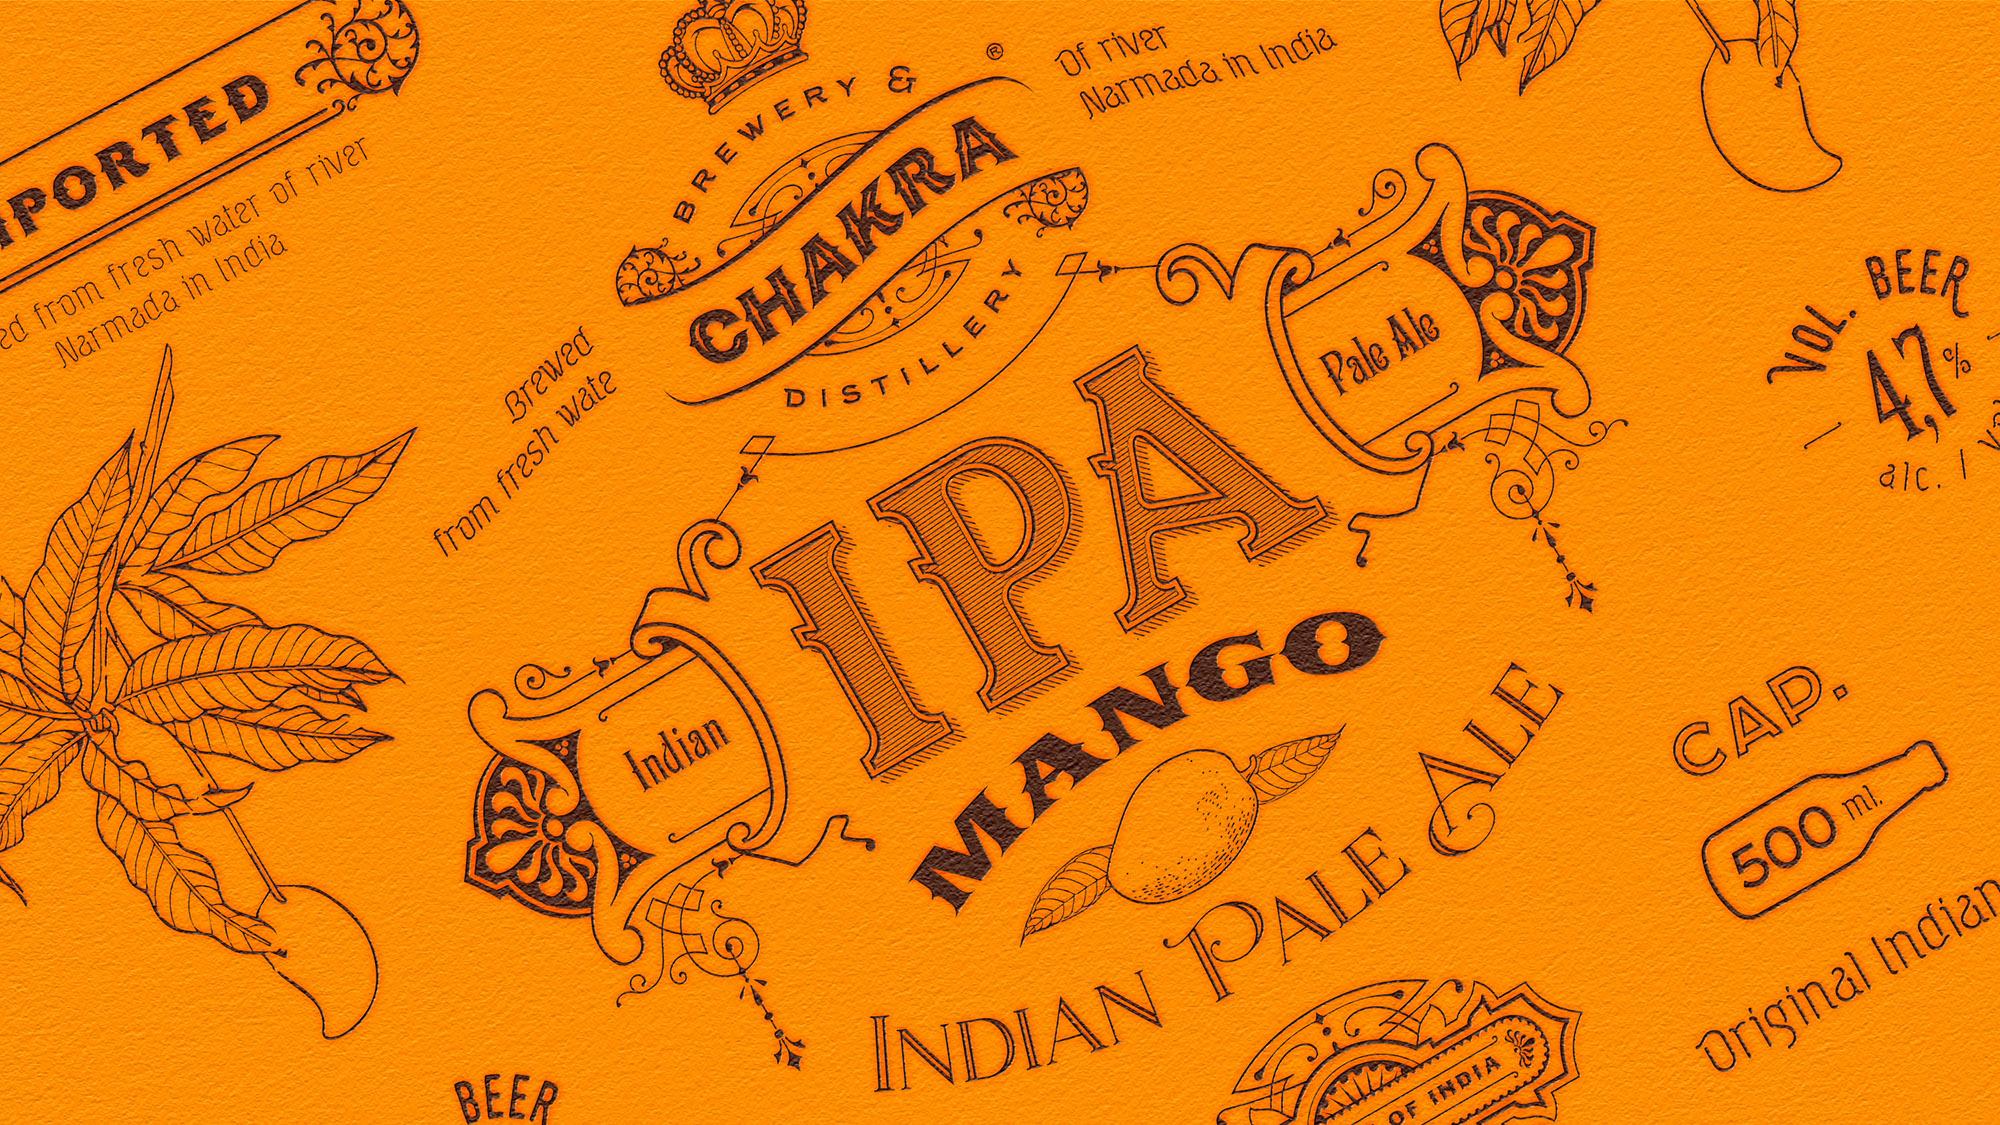 CHAKRA IPA Mango Packaging Design for CHAKRA NORWAY AS / World Brand Design Society